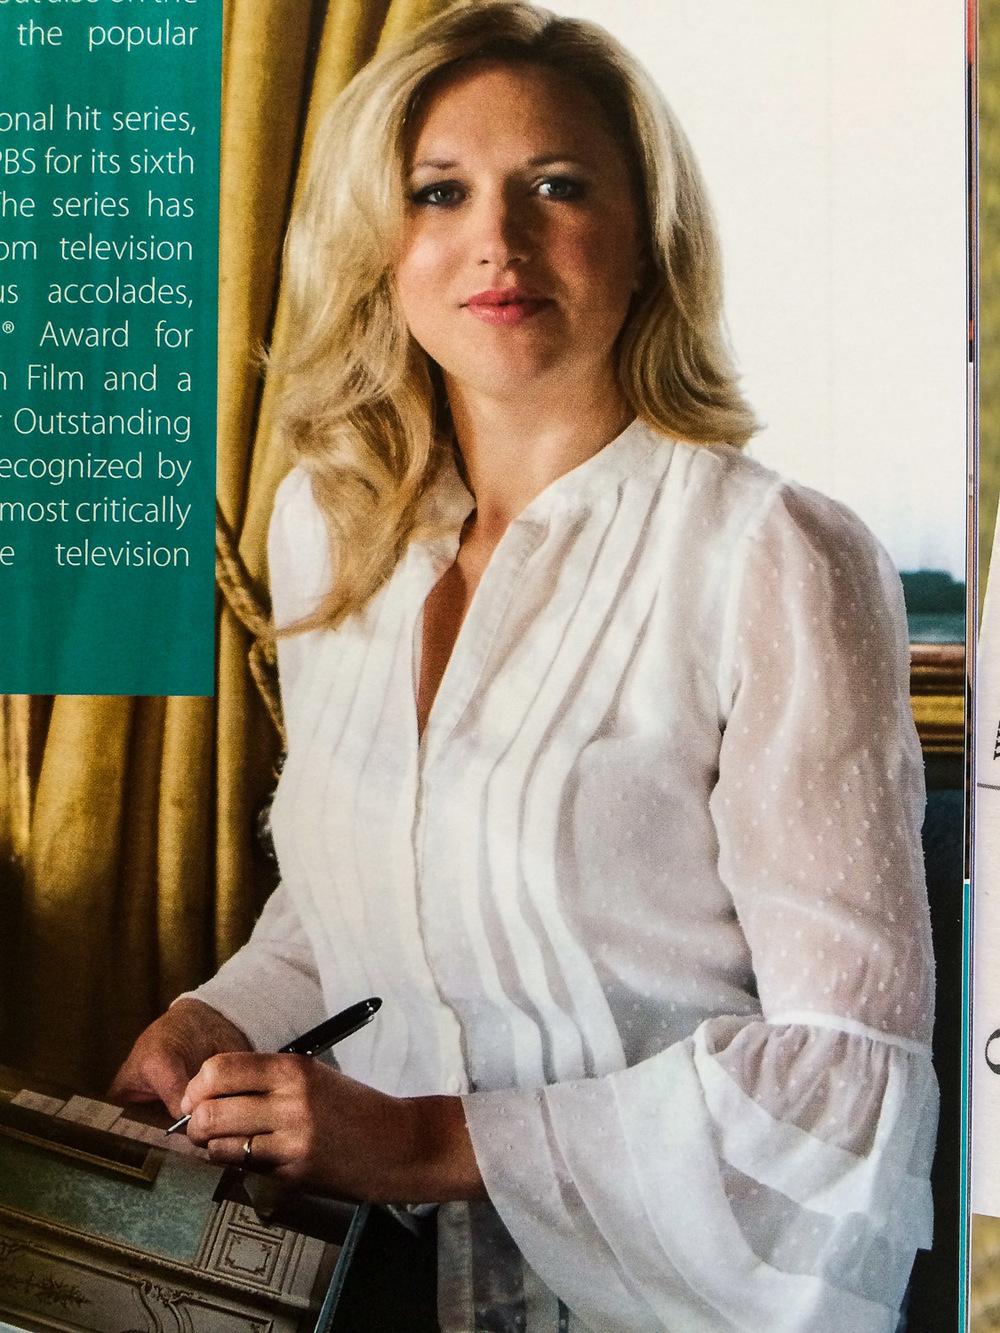 Jessica Fellowes, niece of Julian Fellows of Downton Abbey fame.